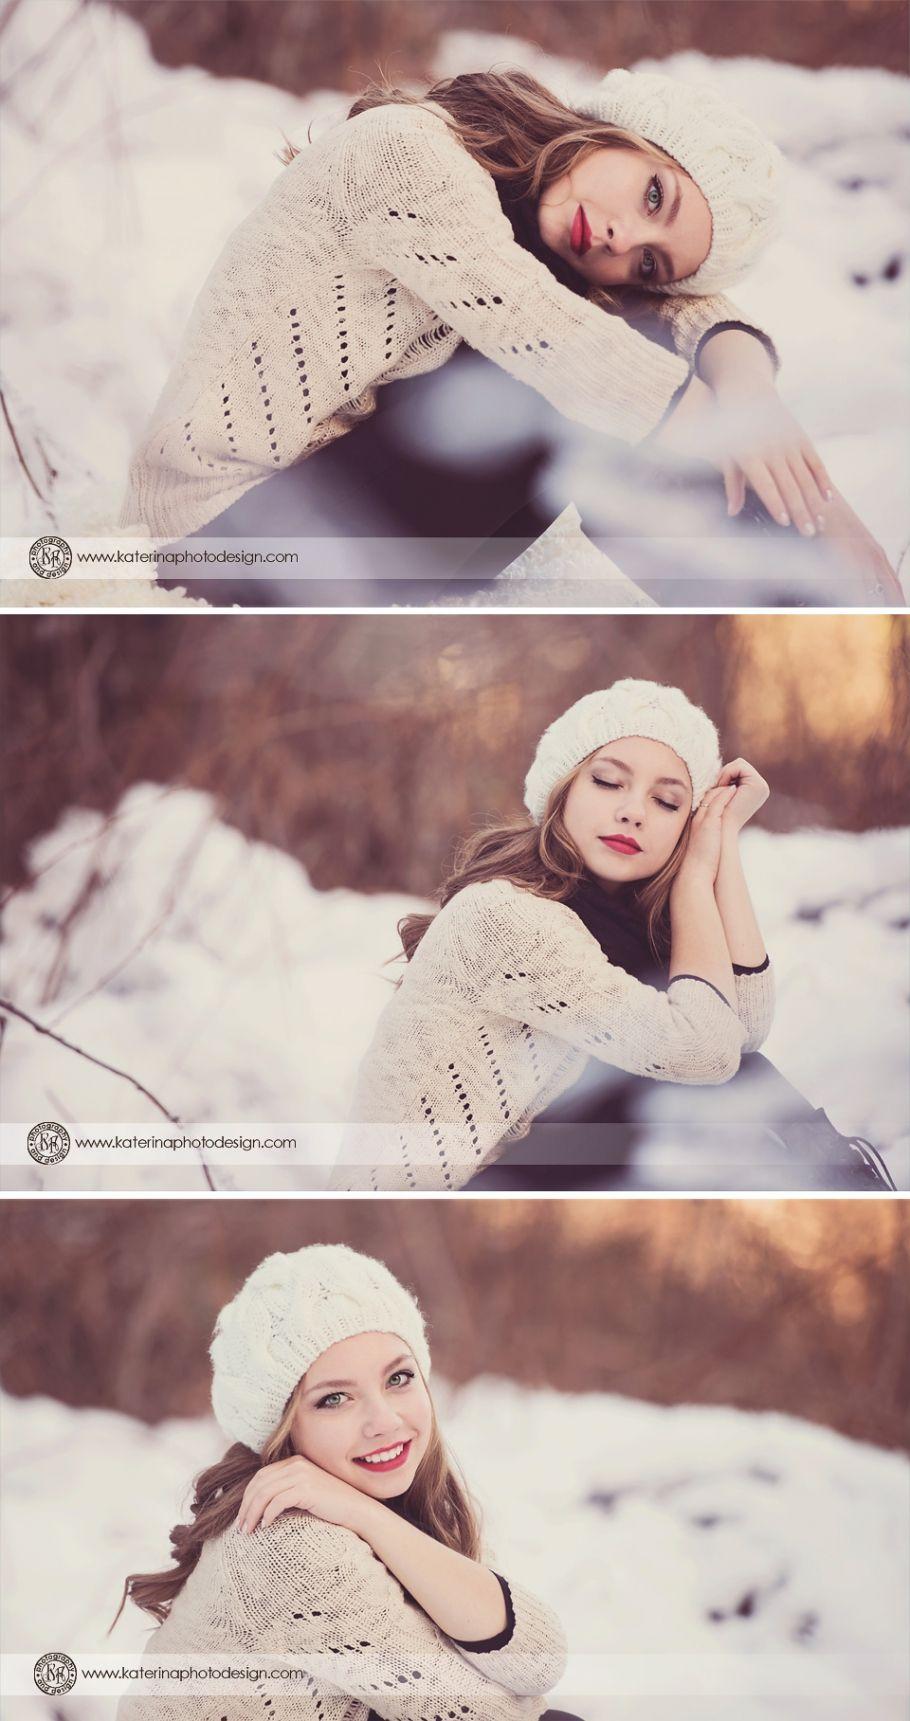 b76f602ca Winter senior picture ideas for girls. Winter senior pictures ...